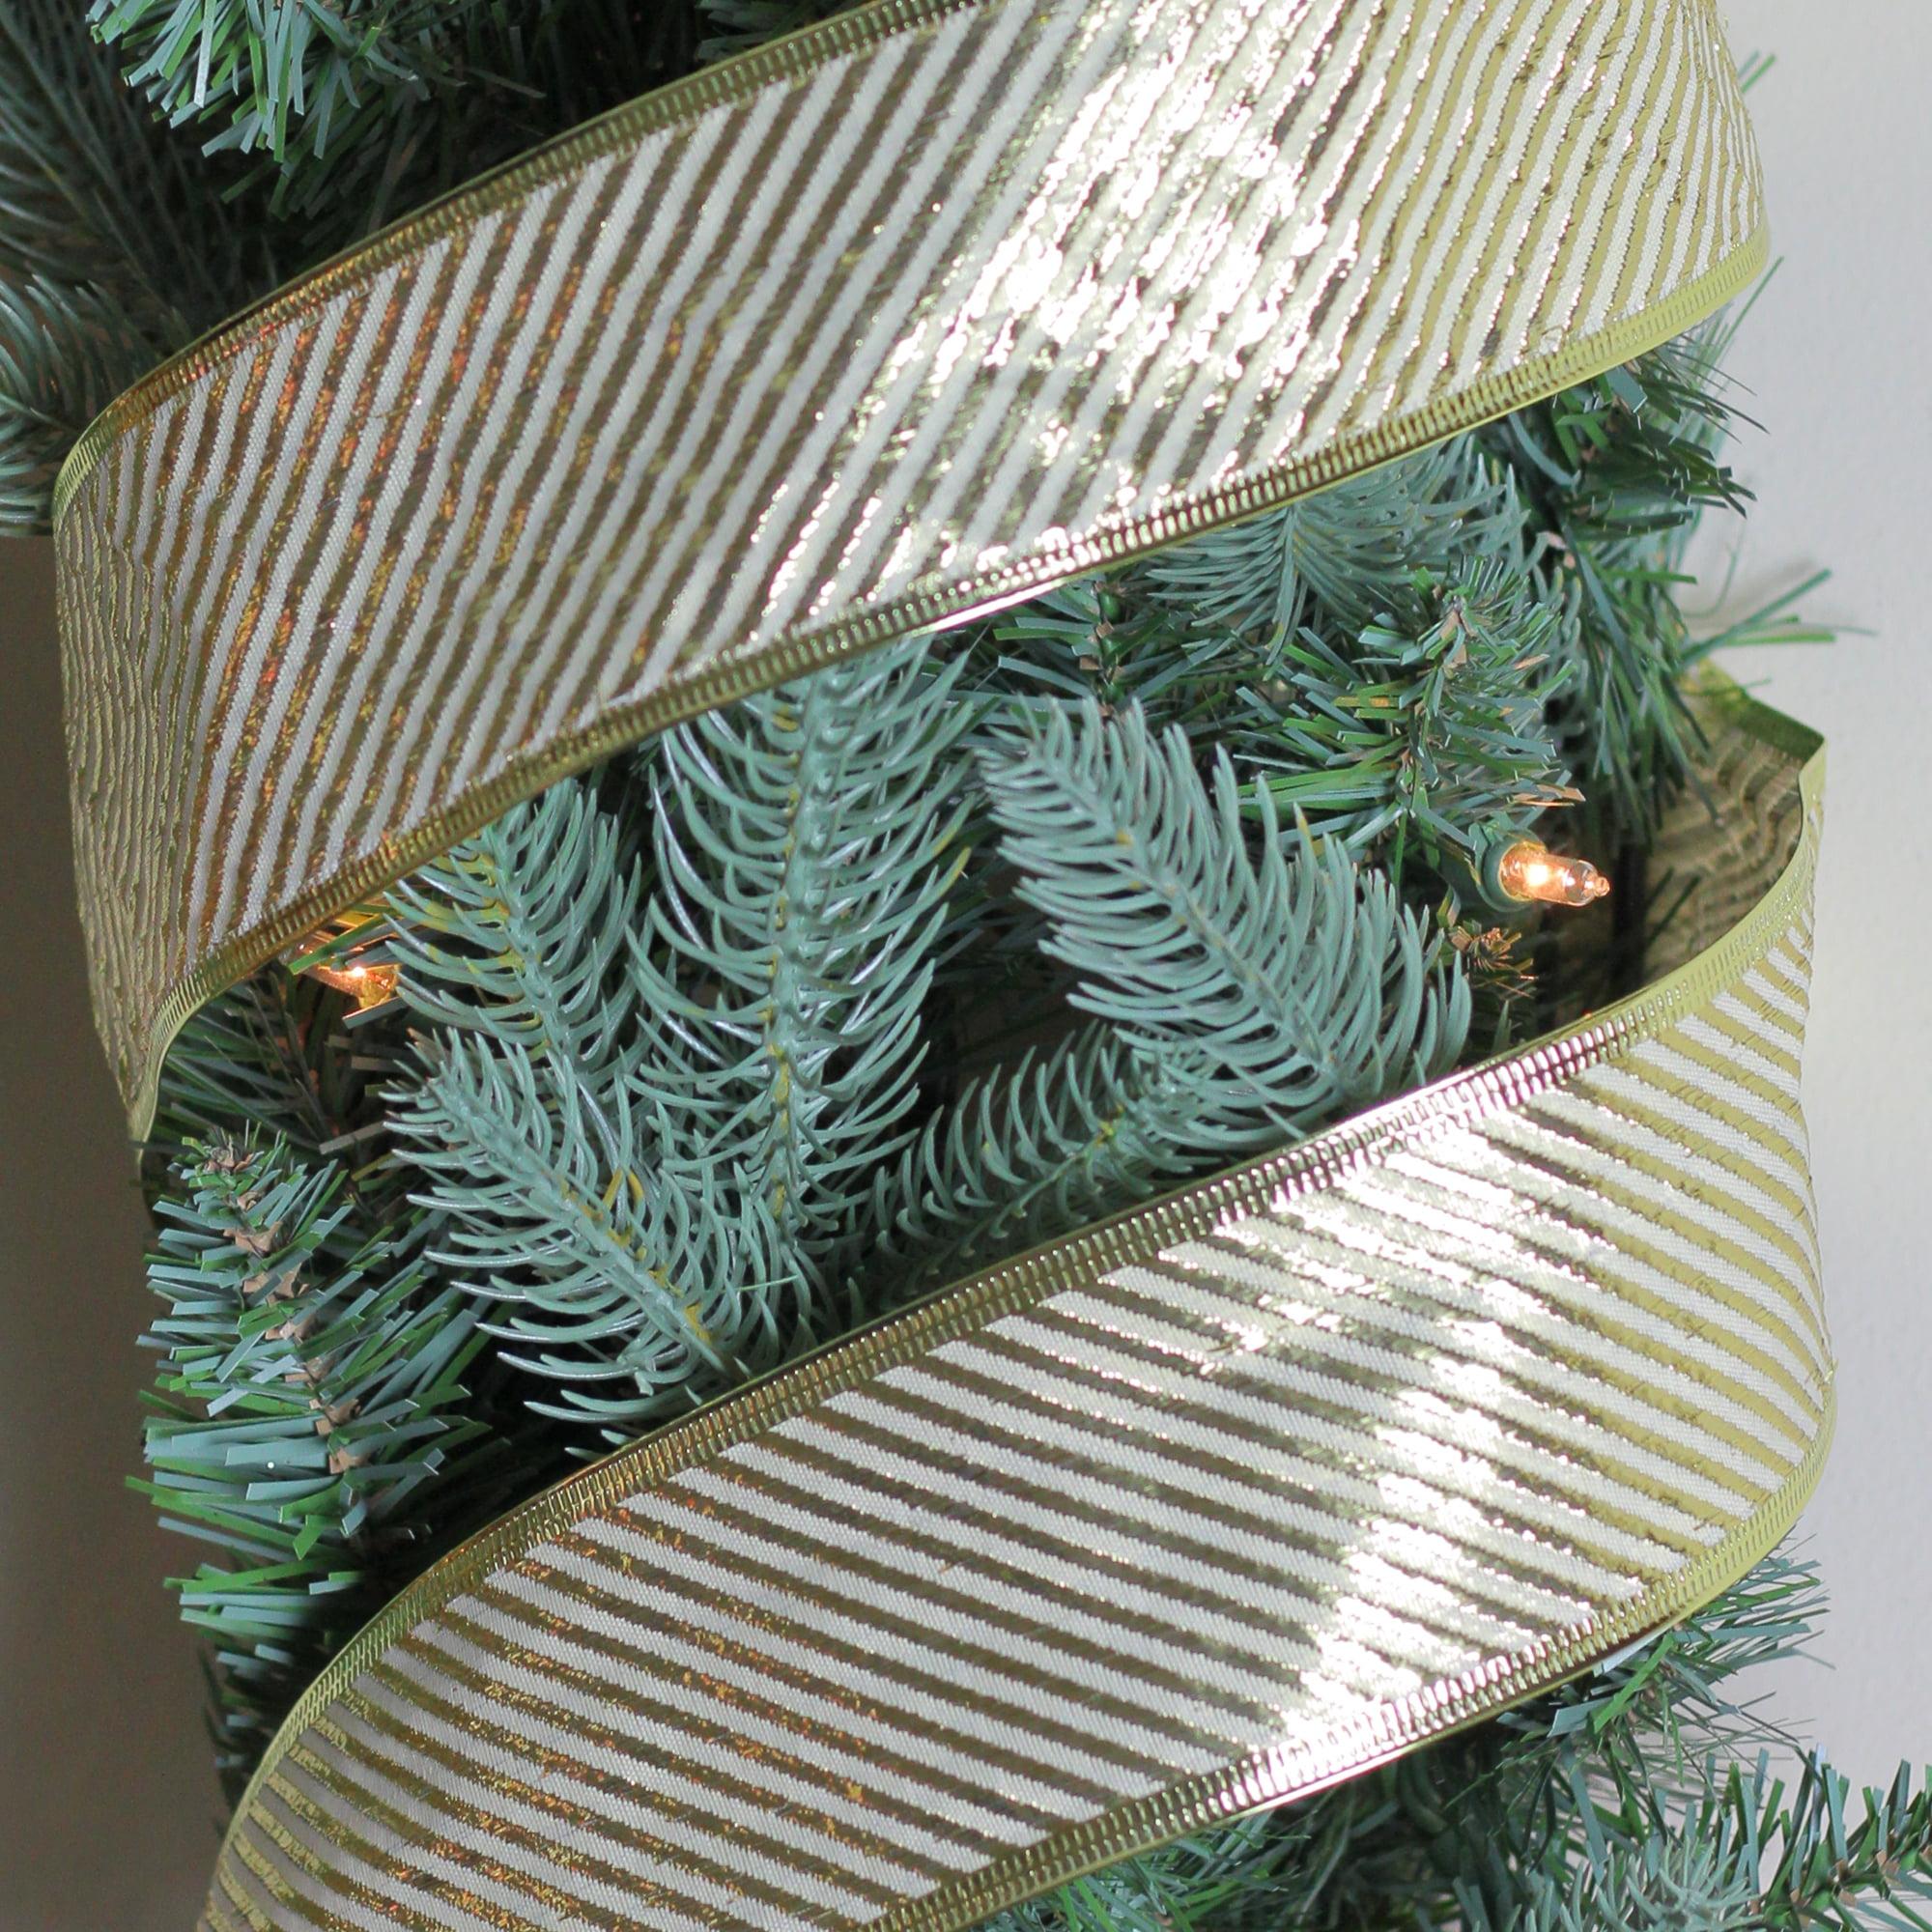 Gold And White Diagonal Stripe Wired Christmas Craft Ribbon 2 5 X 10 Yards Walmart Com Walmart Com